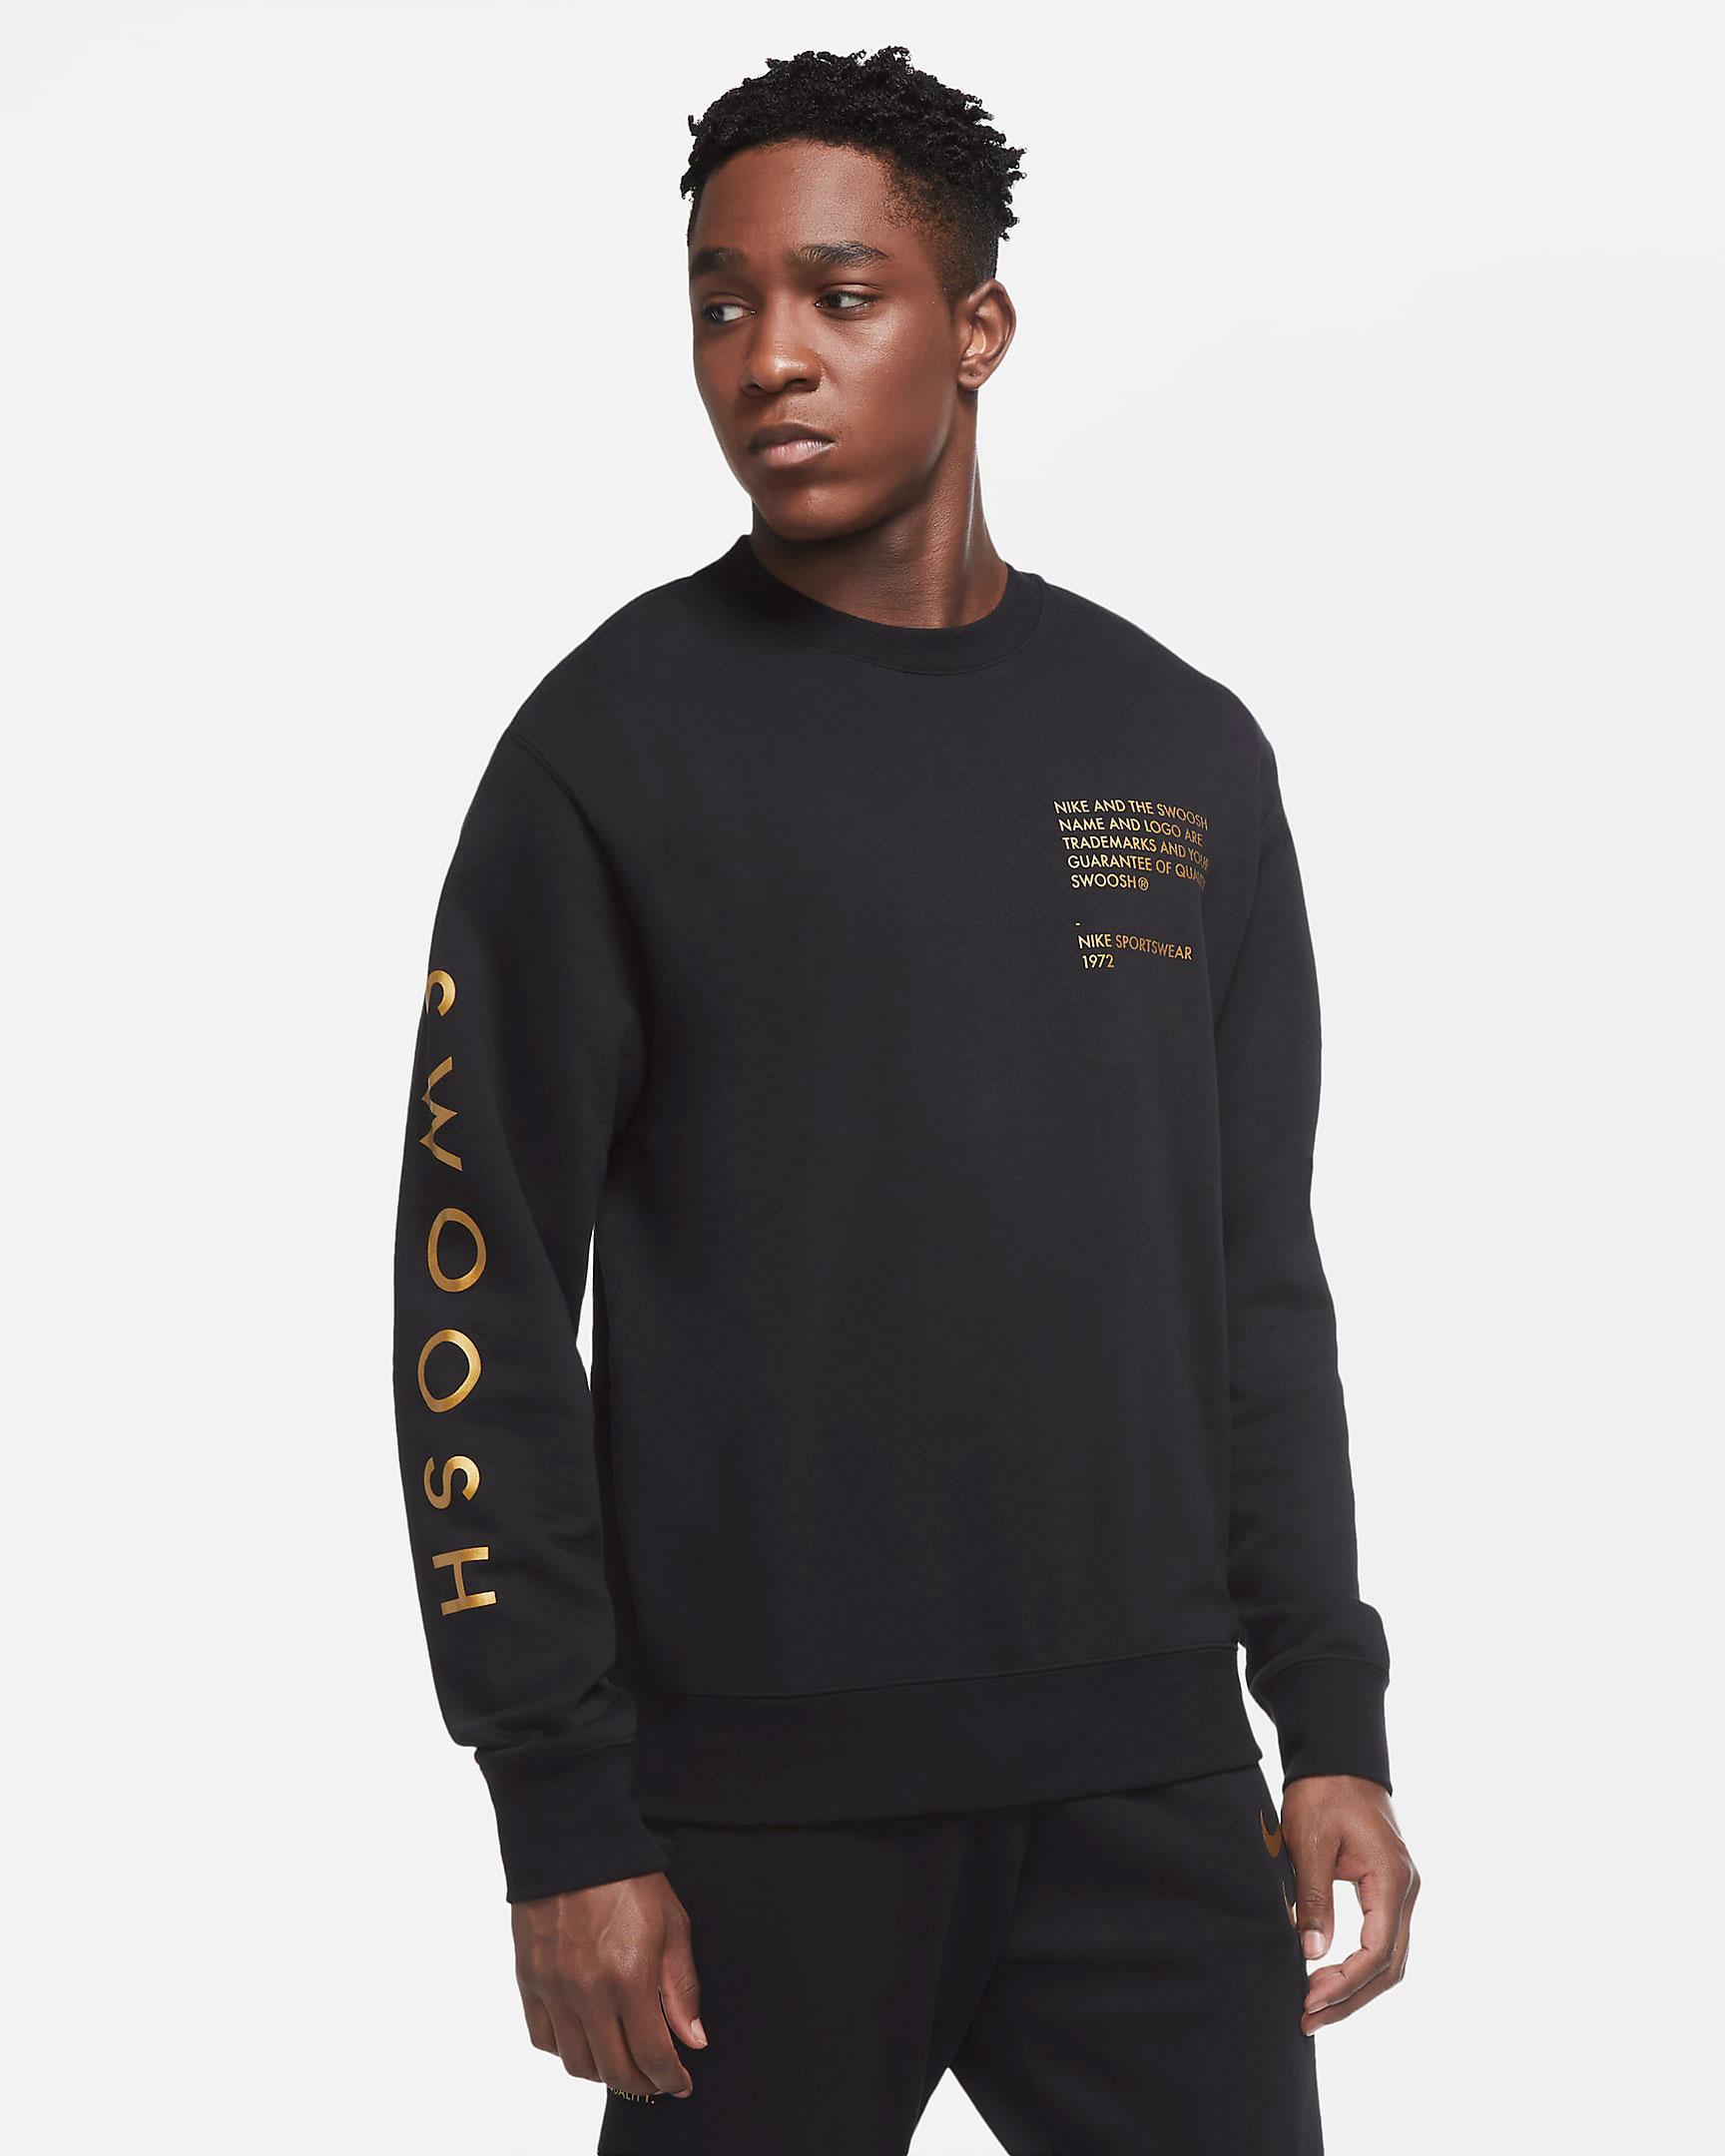 nike-sportswear-swoosh-crew-sweatshirt-black-metallic-gold-1